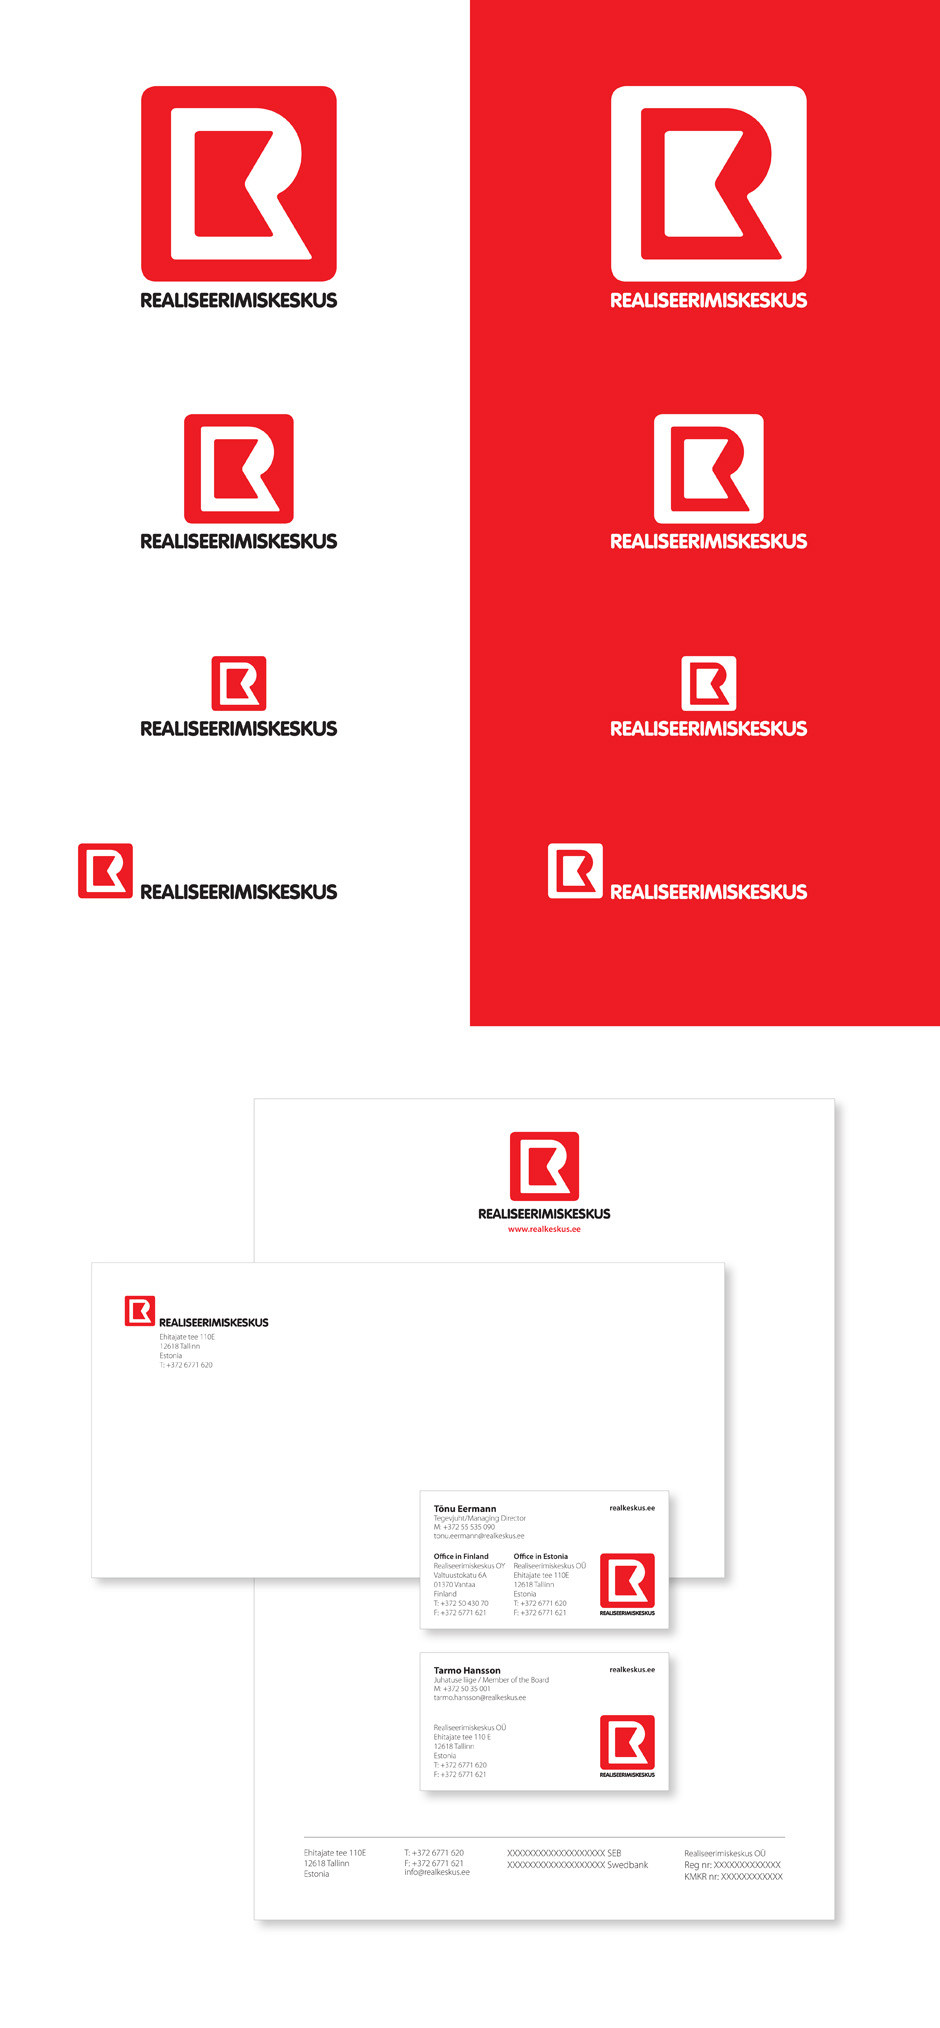 realkeskus_logo_kodukas